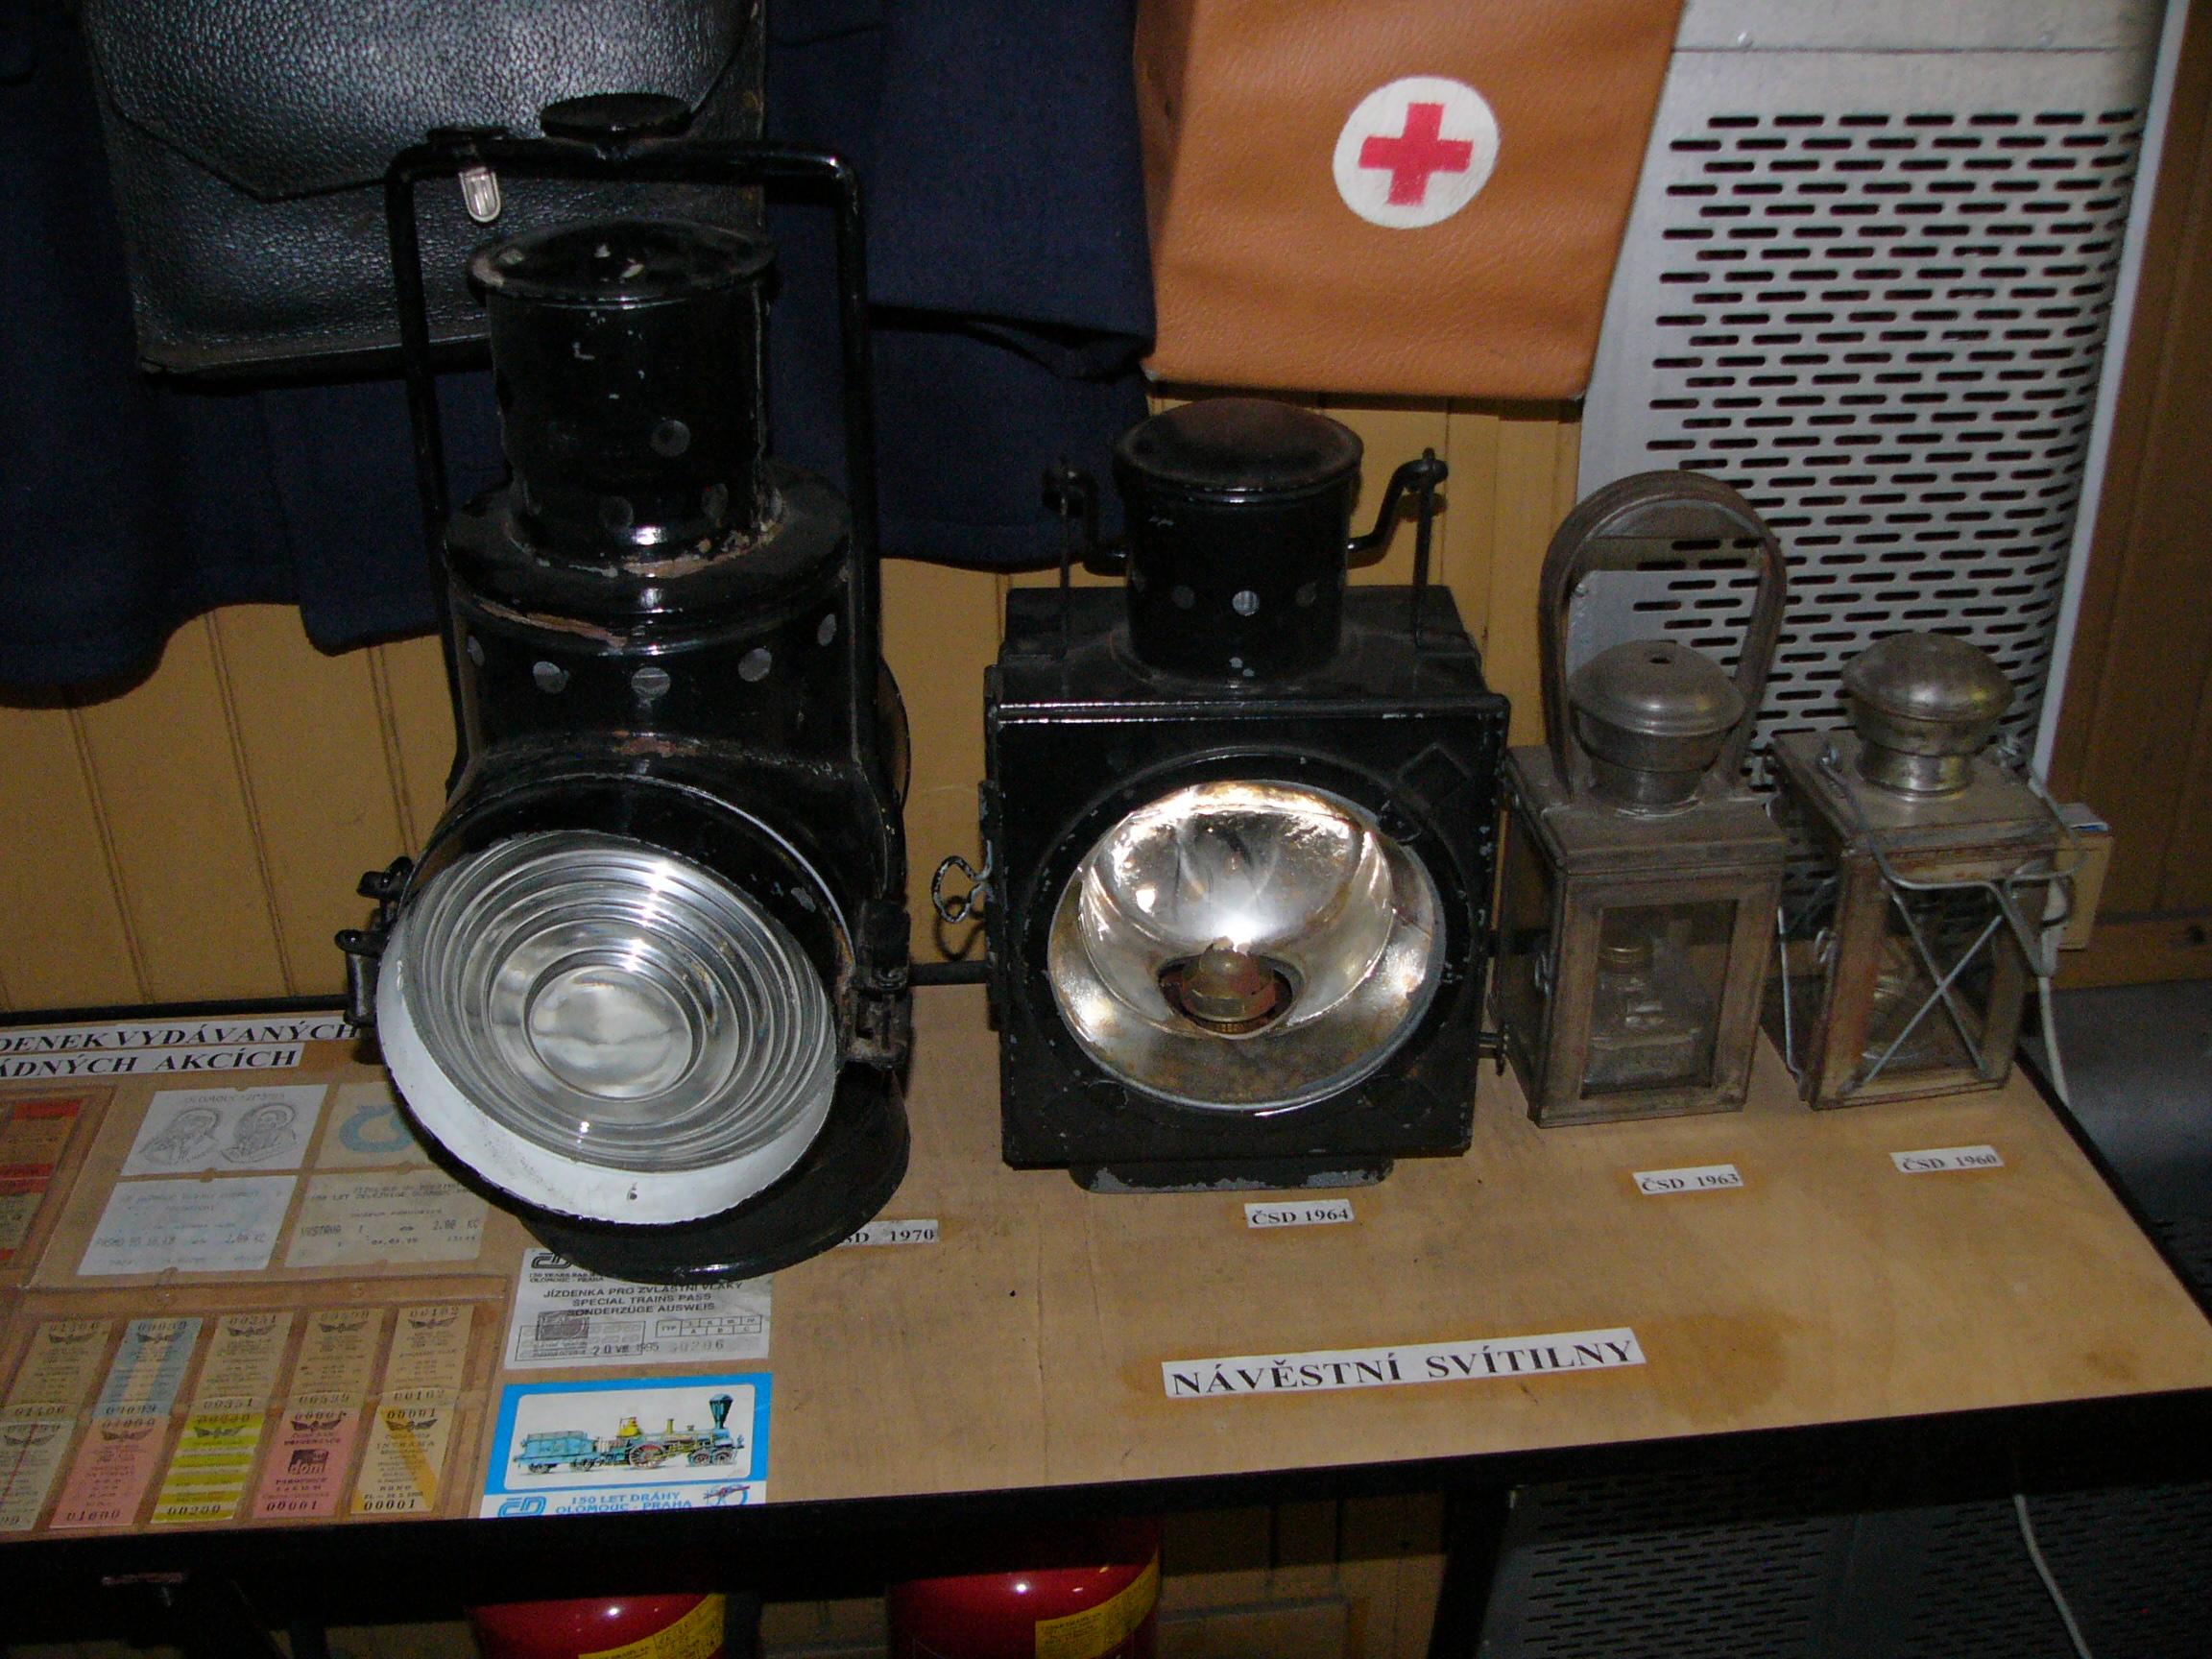 File:Railroad signal lanterns jpg - Wikimedia Commons